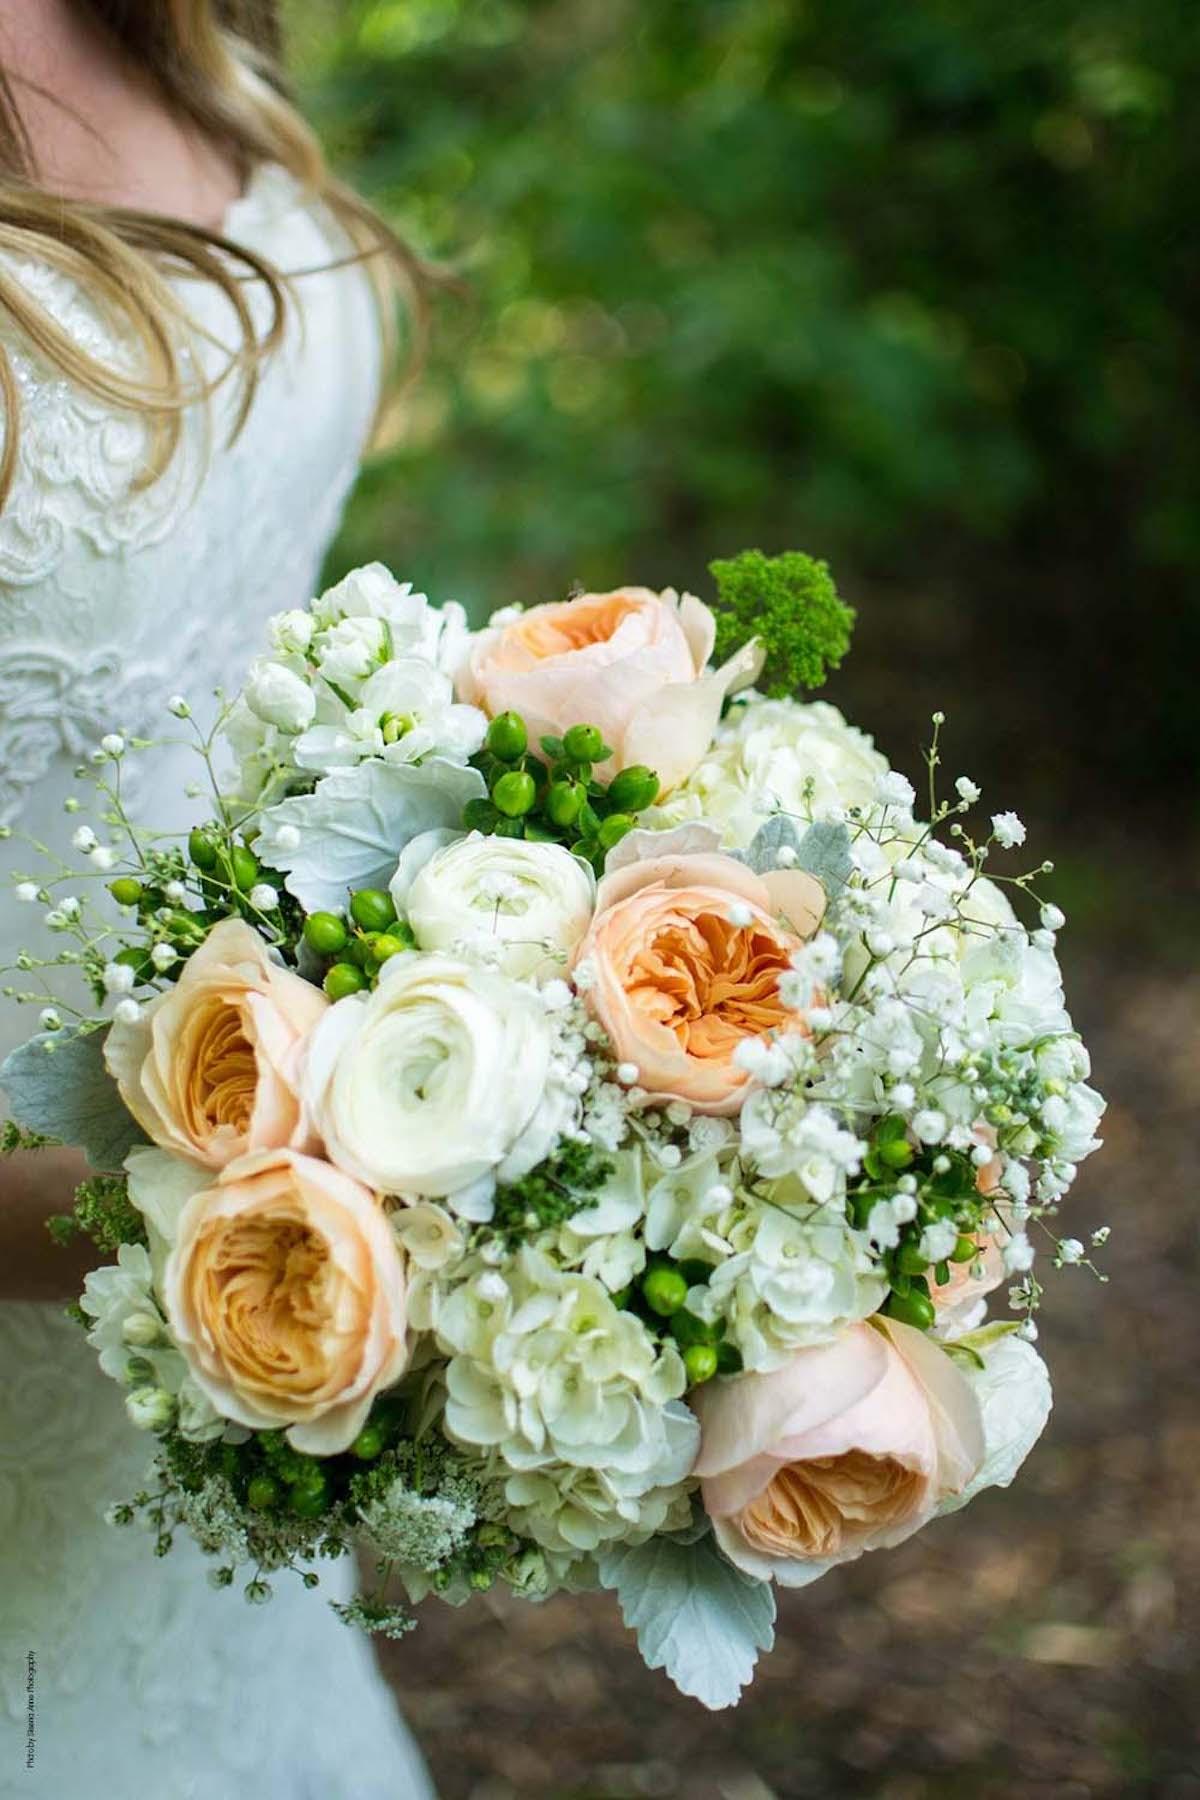 Pastel peach and white wedding bouquet